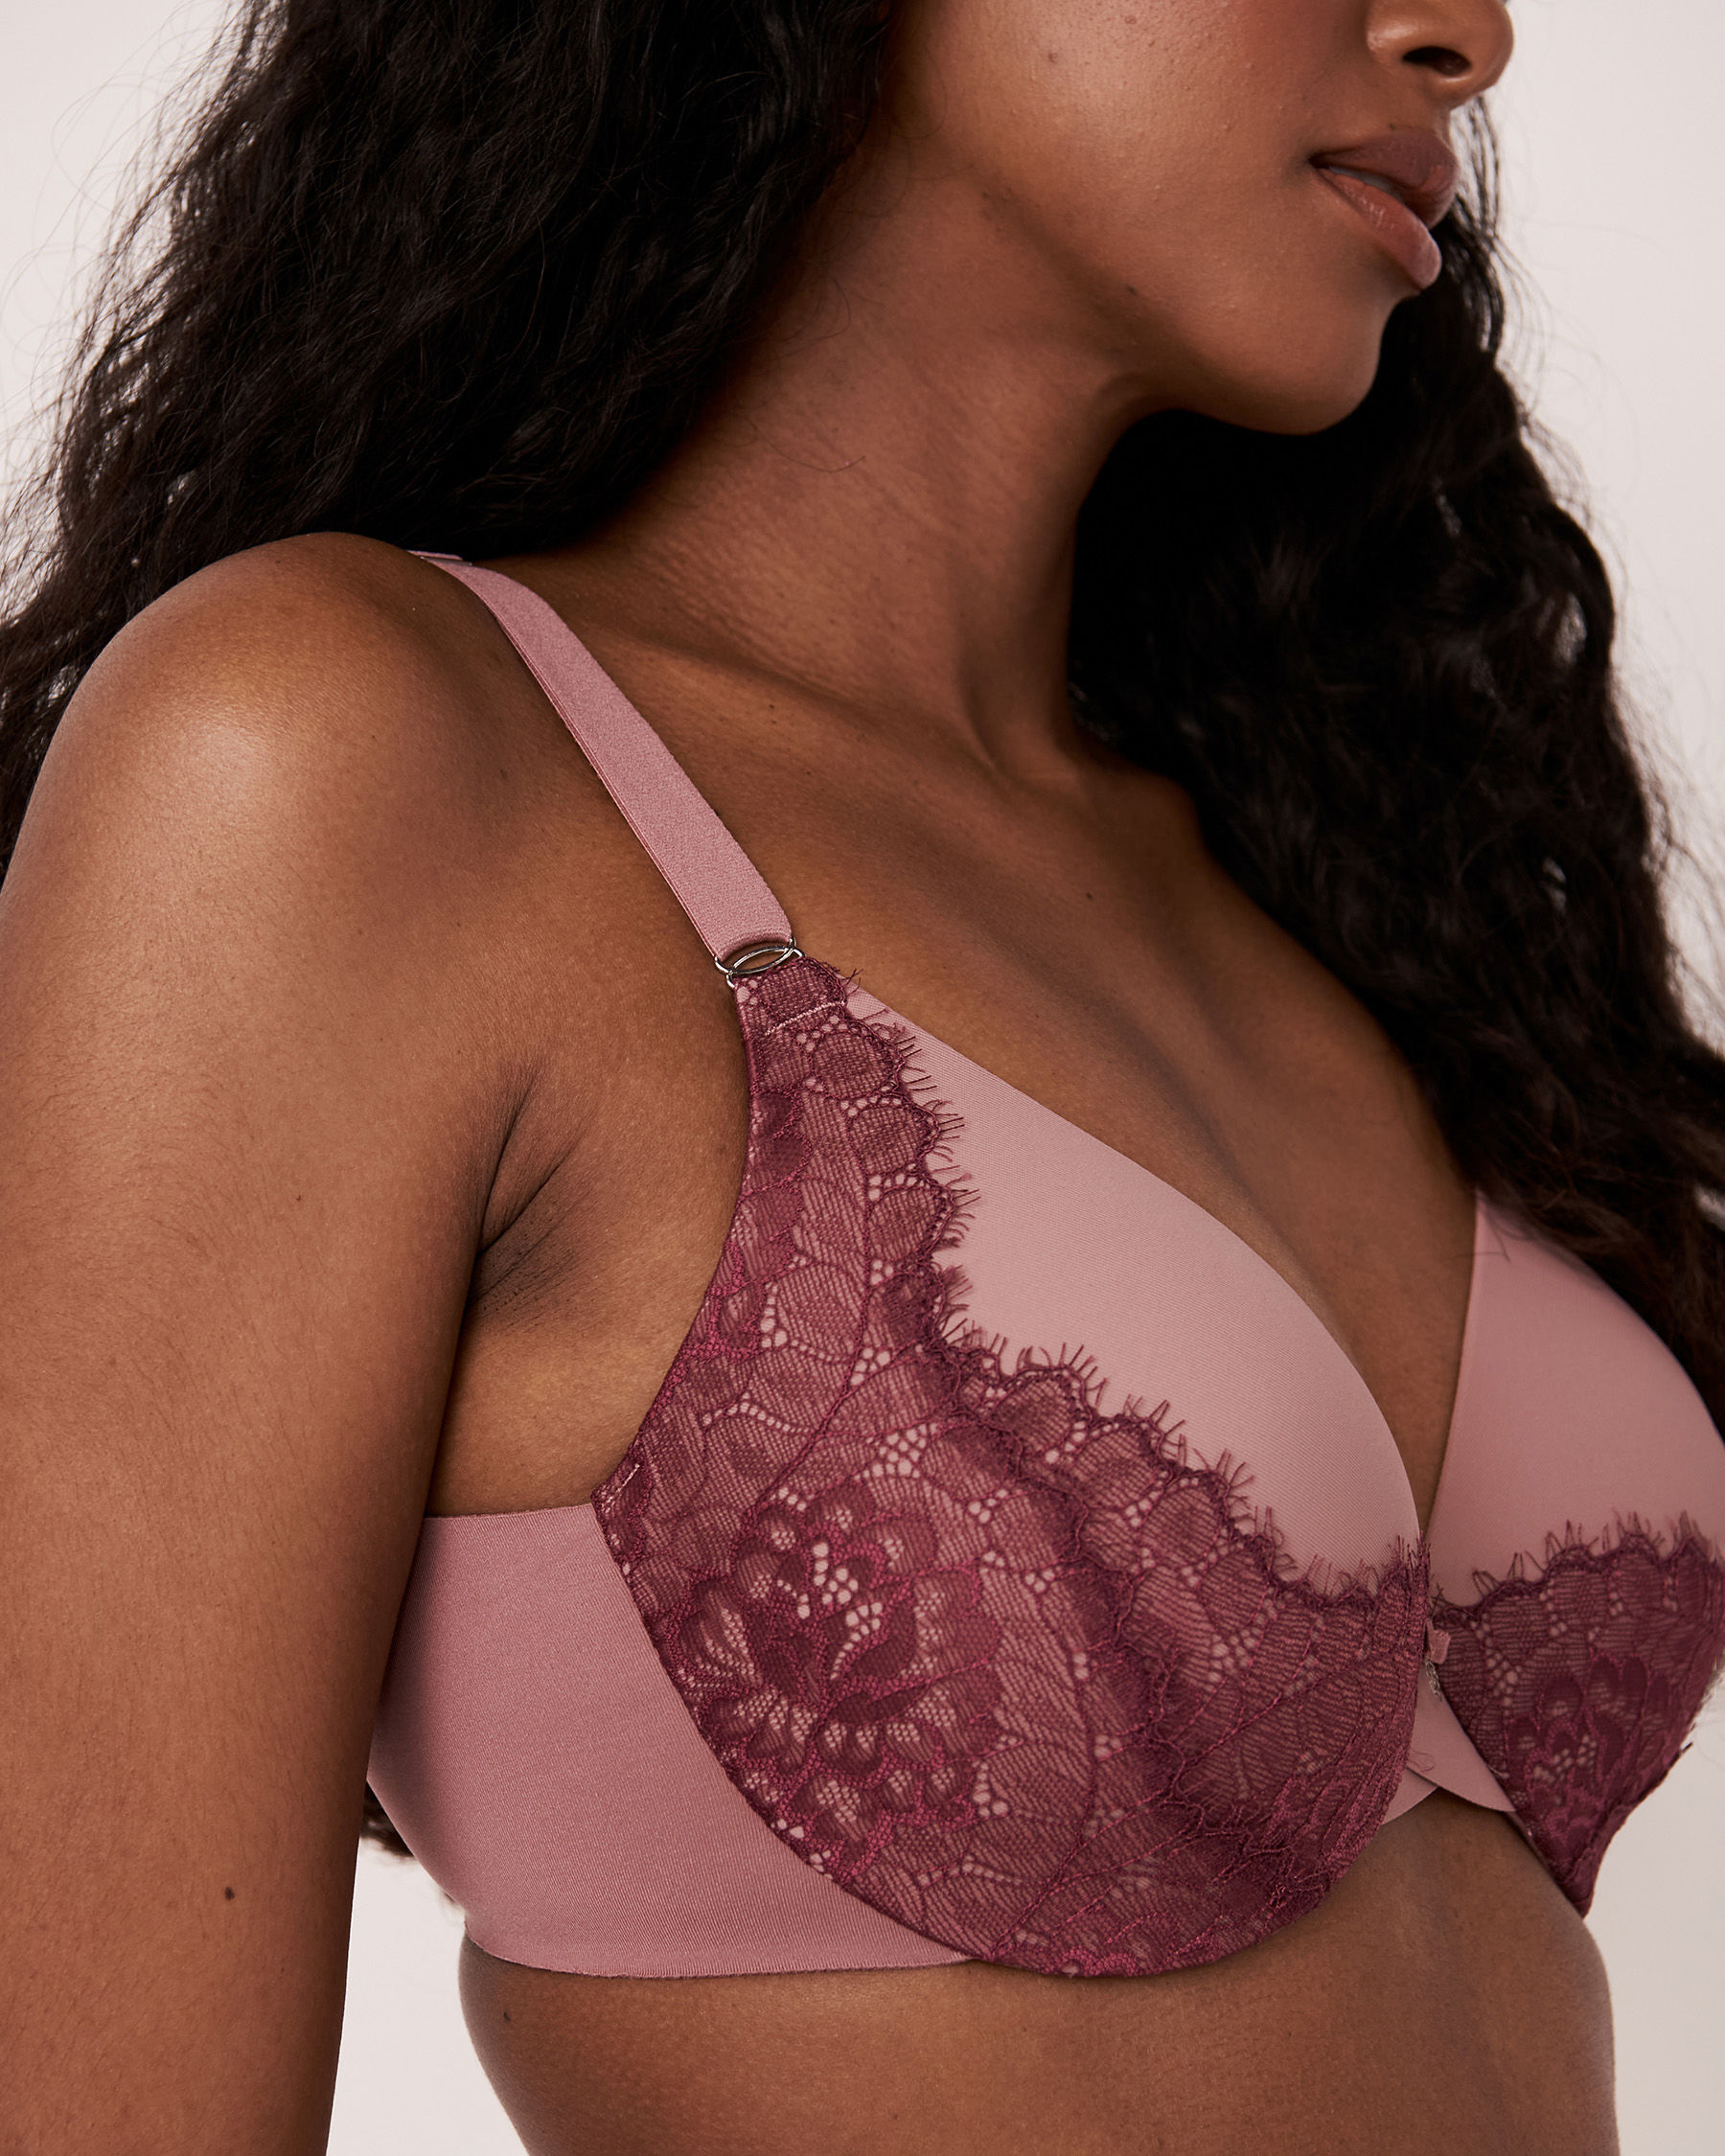 LA VIE EN ROSE Lightly Lined Sleek Back Bra Old pink 10200072 - View3